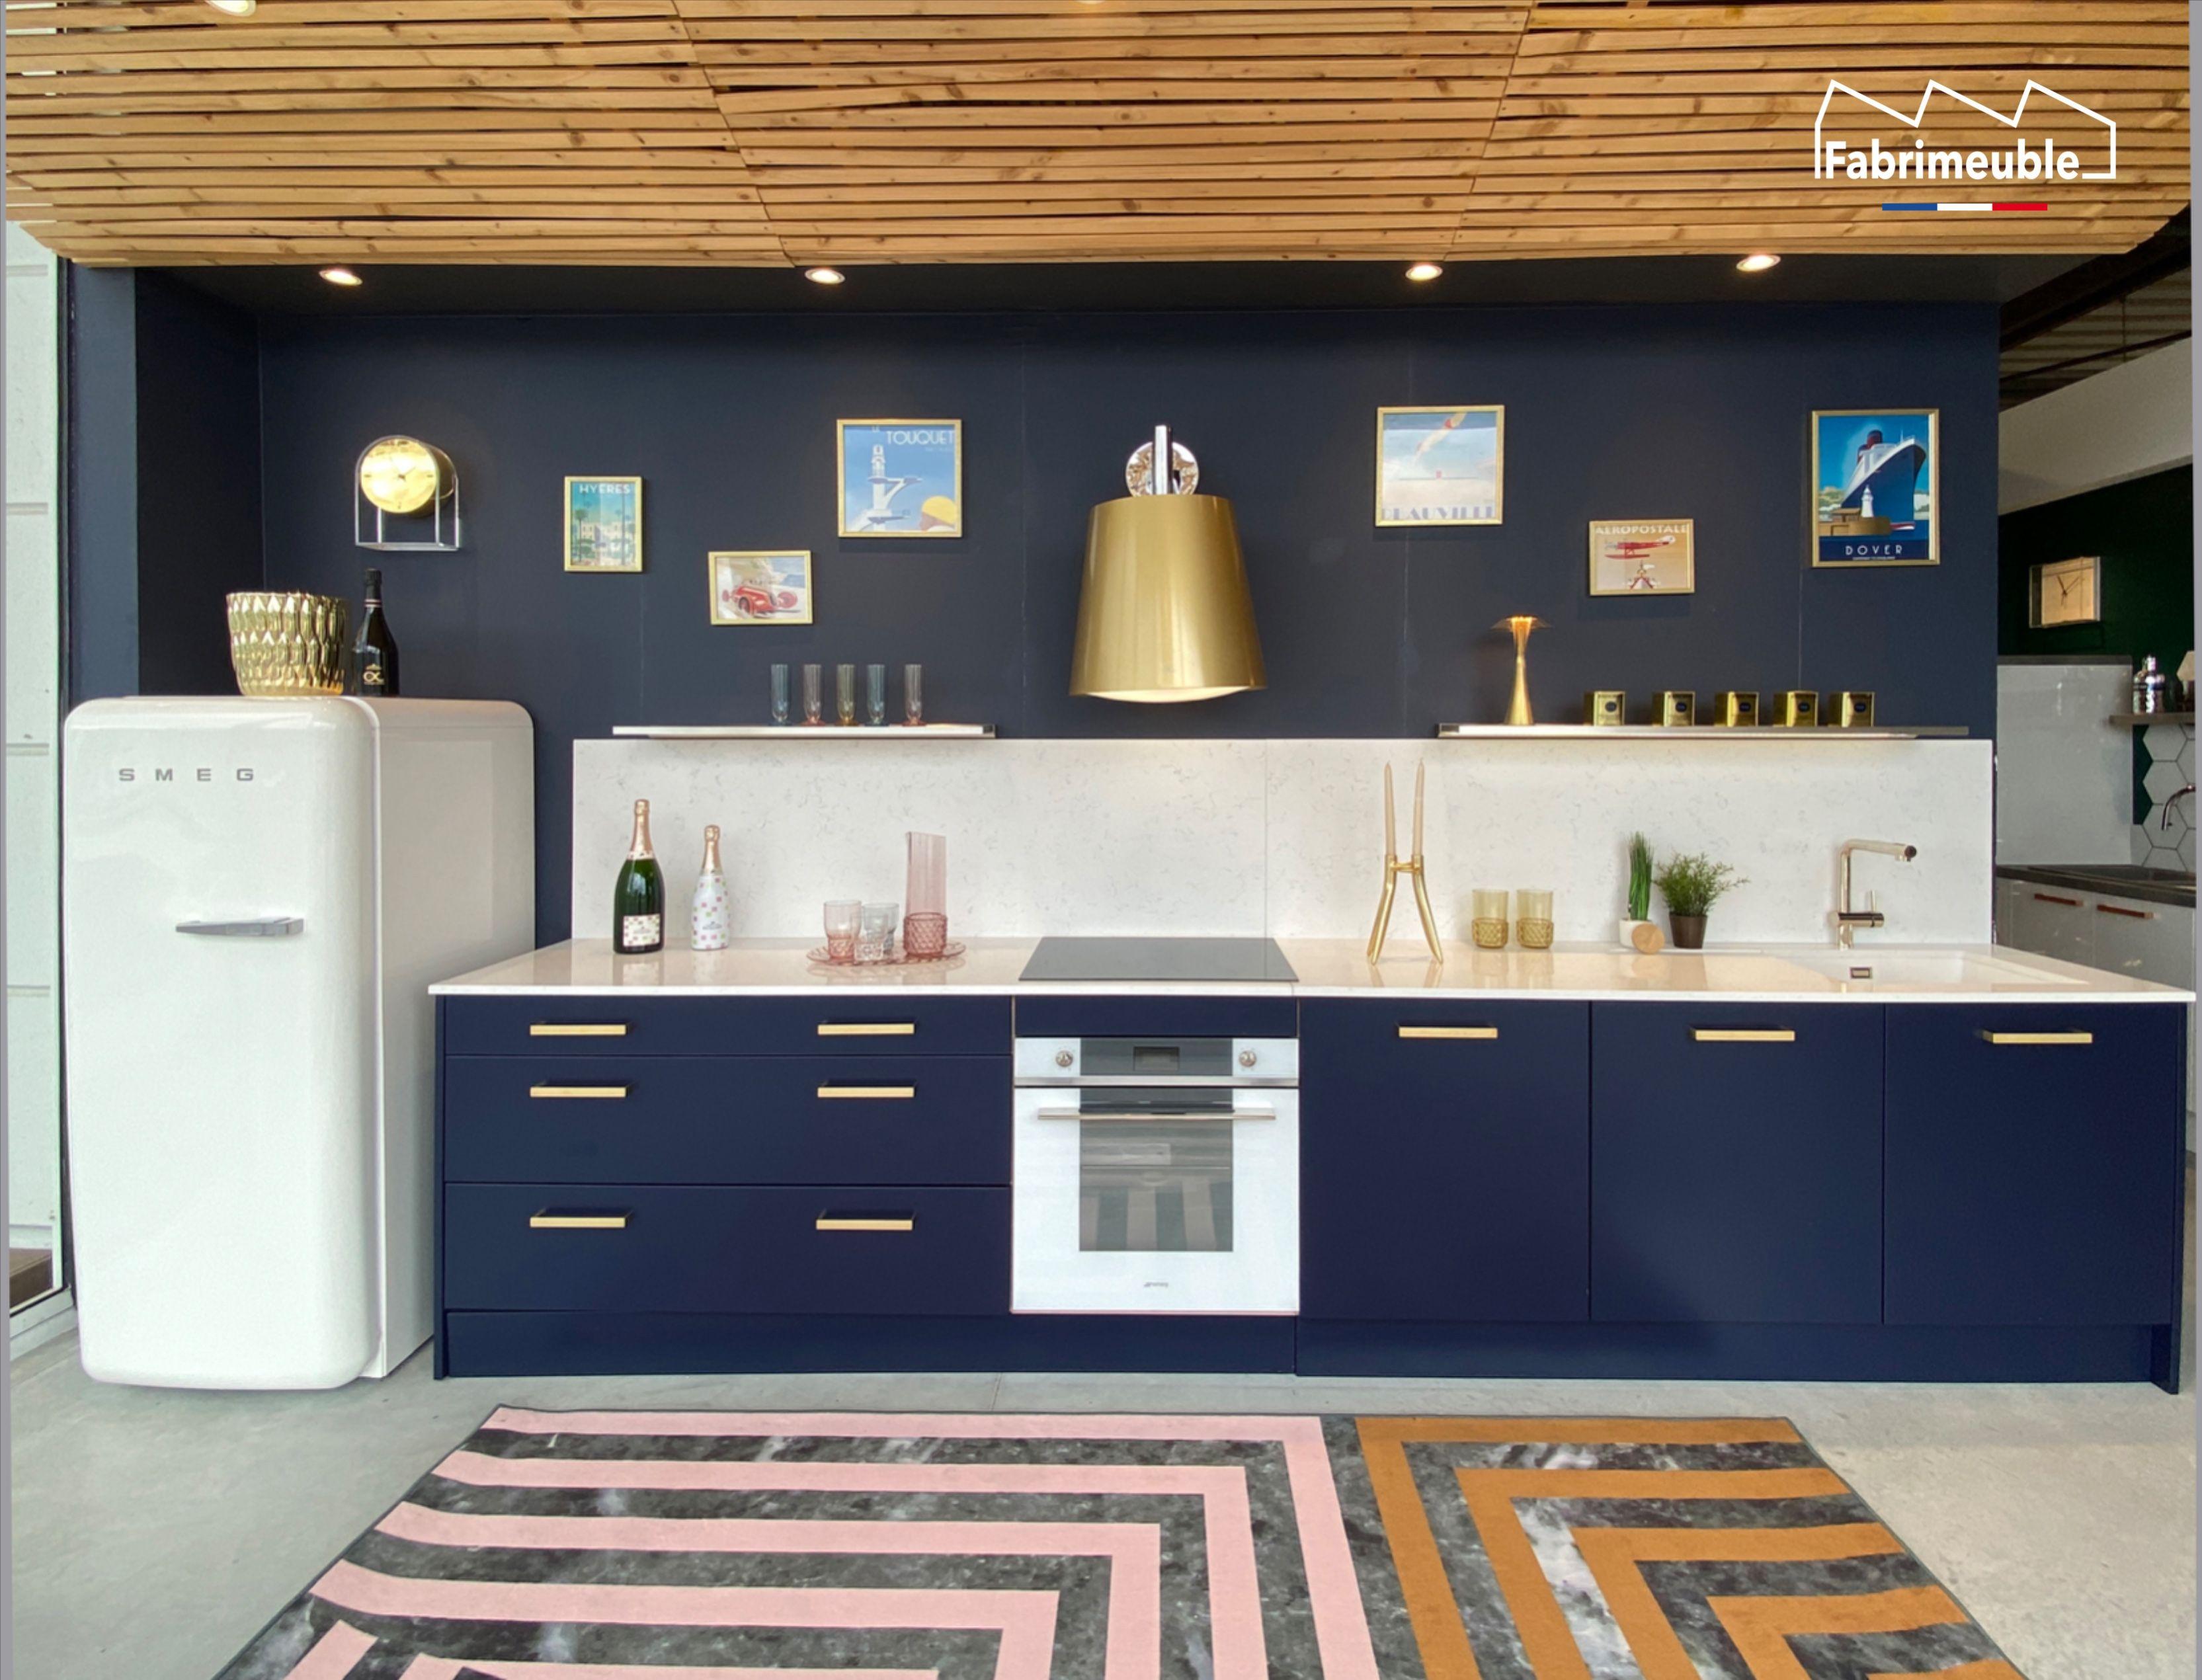 Cuisine Bleu Nuit Bleu Marine Et Or Art Deco Made In France En 2020 Poignee Meuble Cuisine Meuble Cuisine Fabricant Cuisine